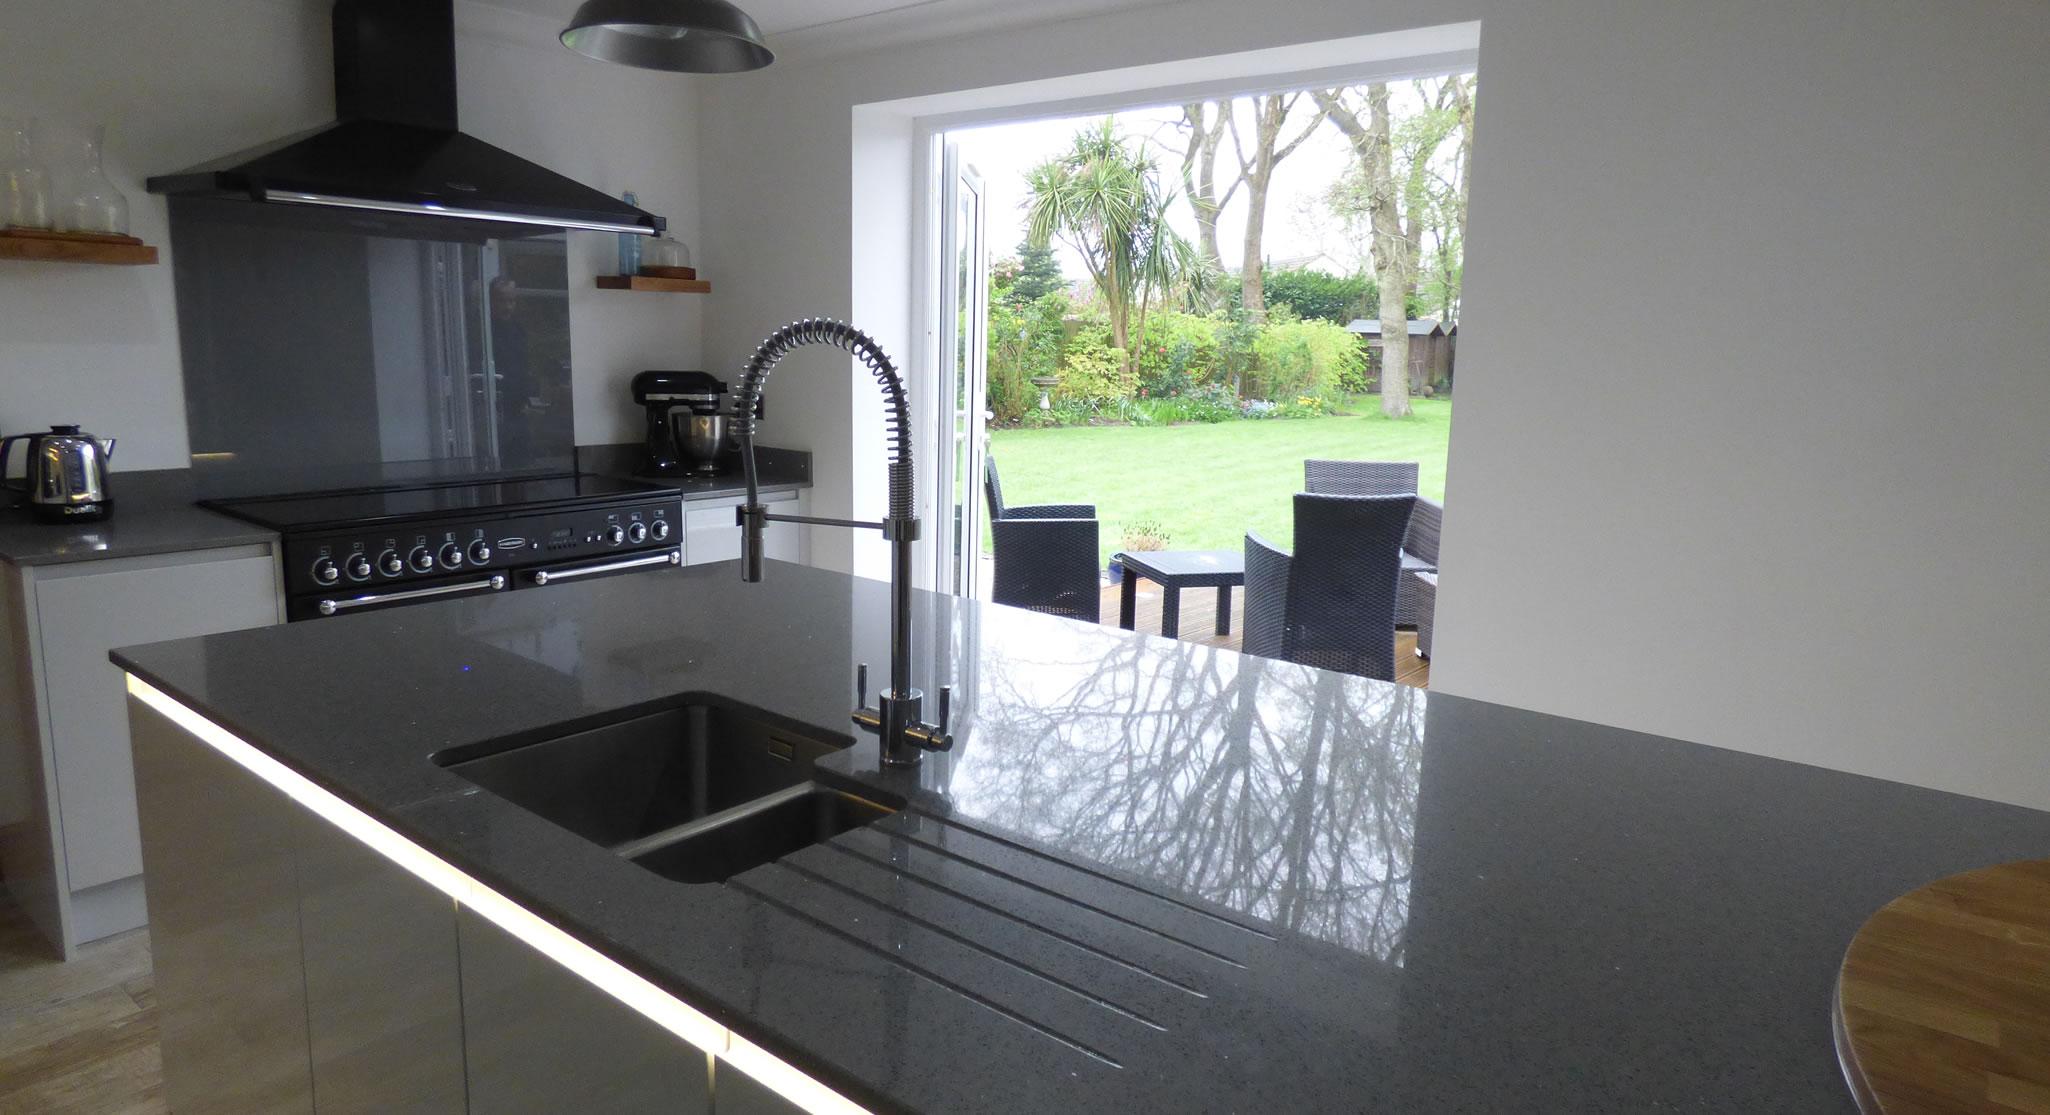 Verwood Kitchens and Bathrooms - Kitchen design and installation